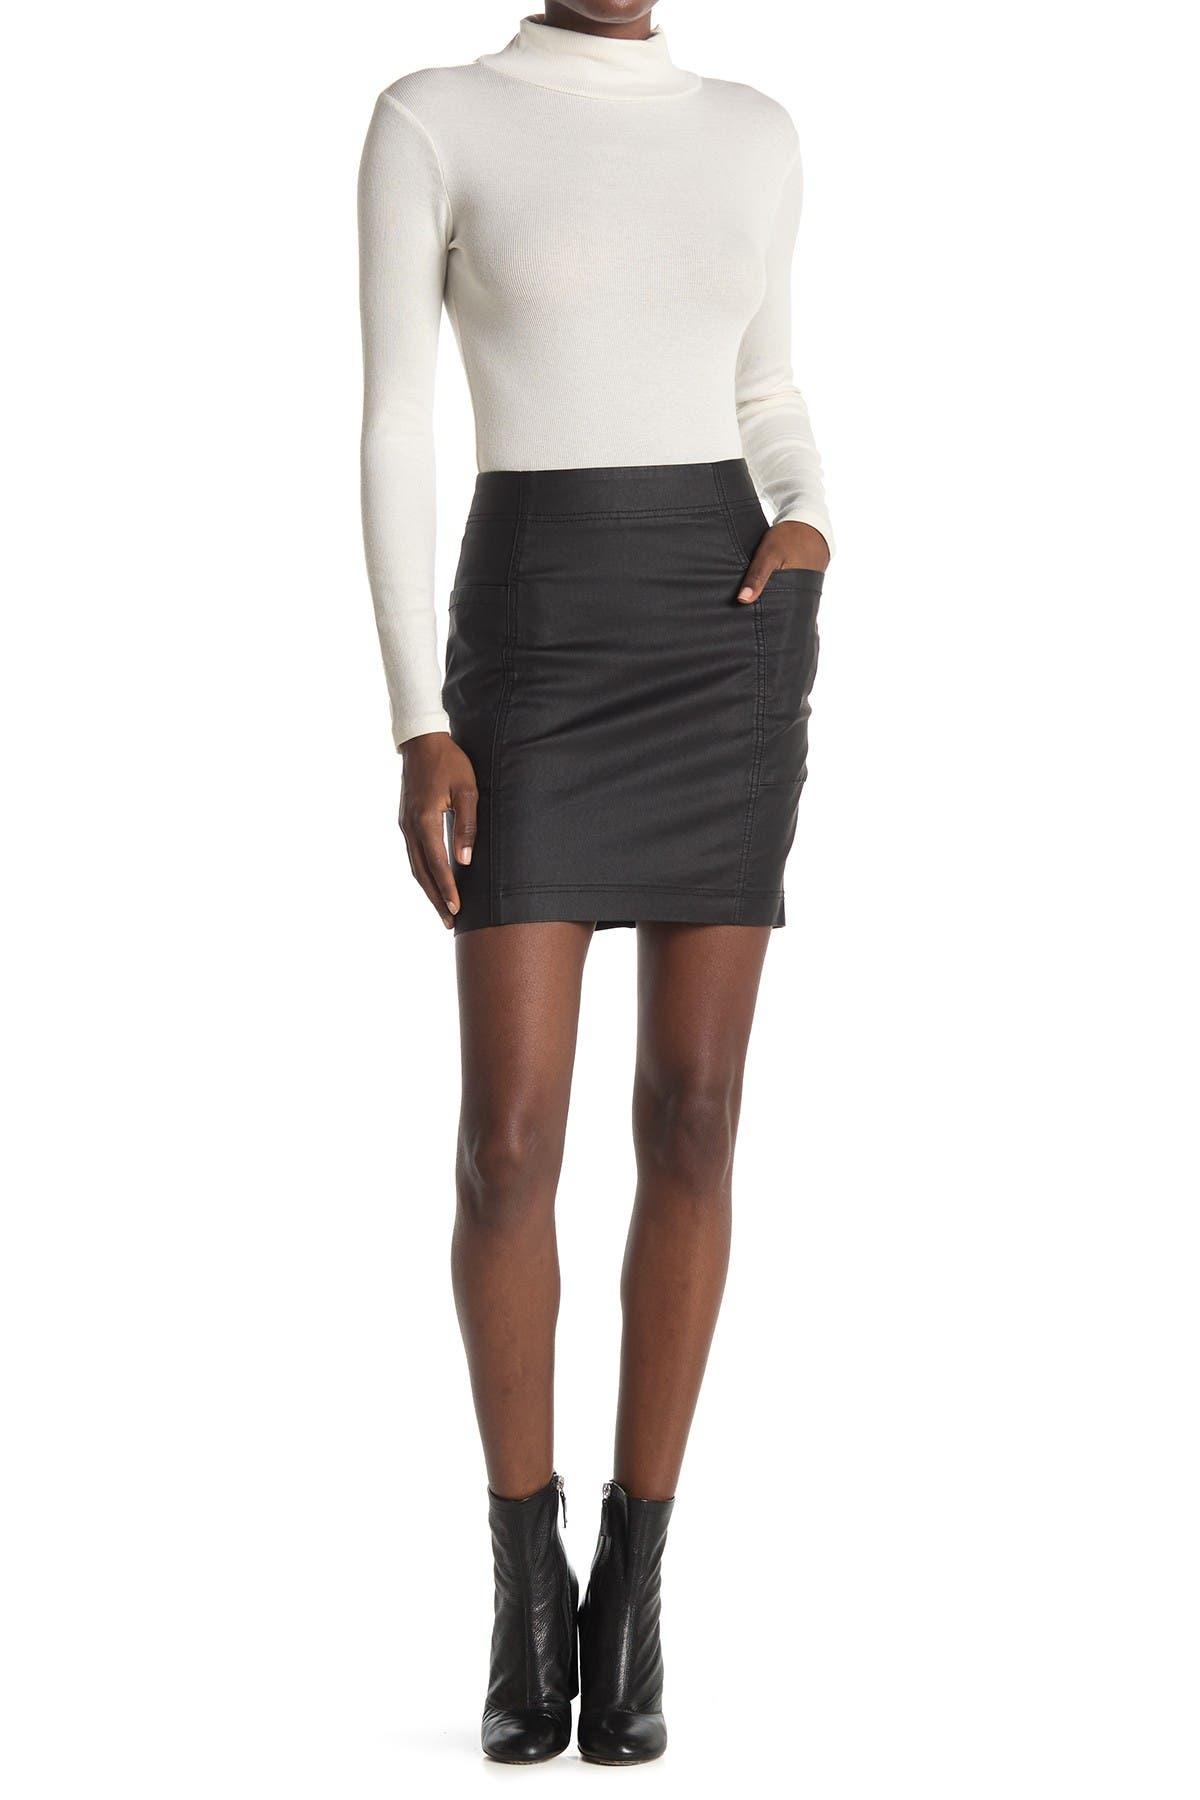 Image of Tinsel Denim Utility Skirt